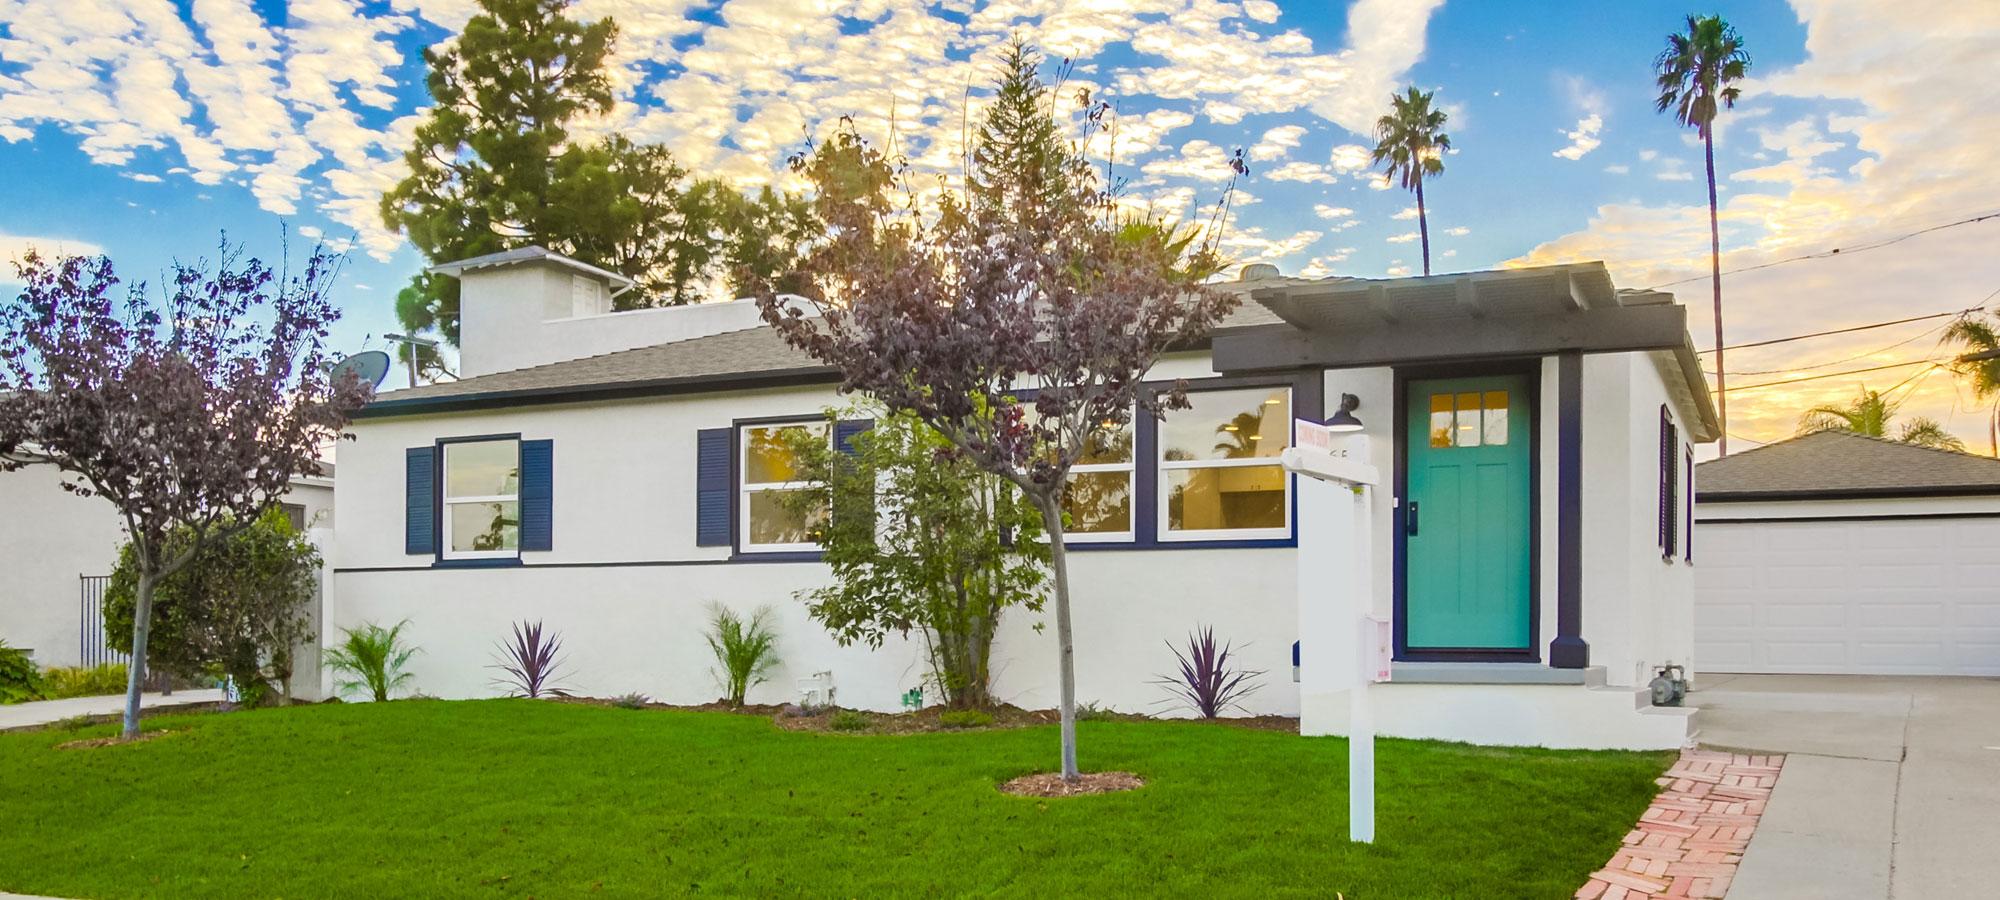 3658 Ingraham St, San Diego, CA 92109